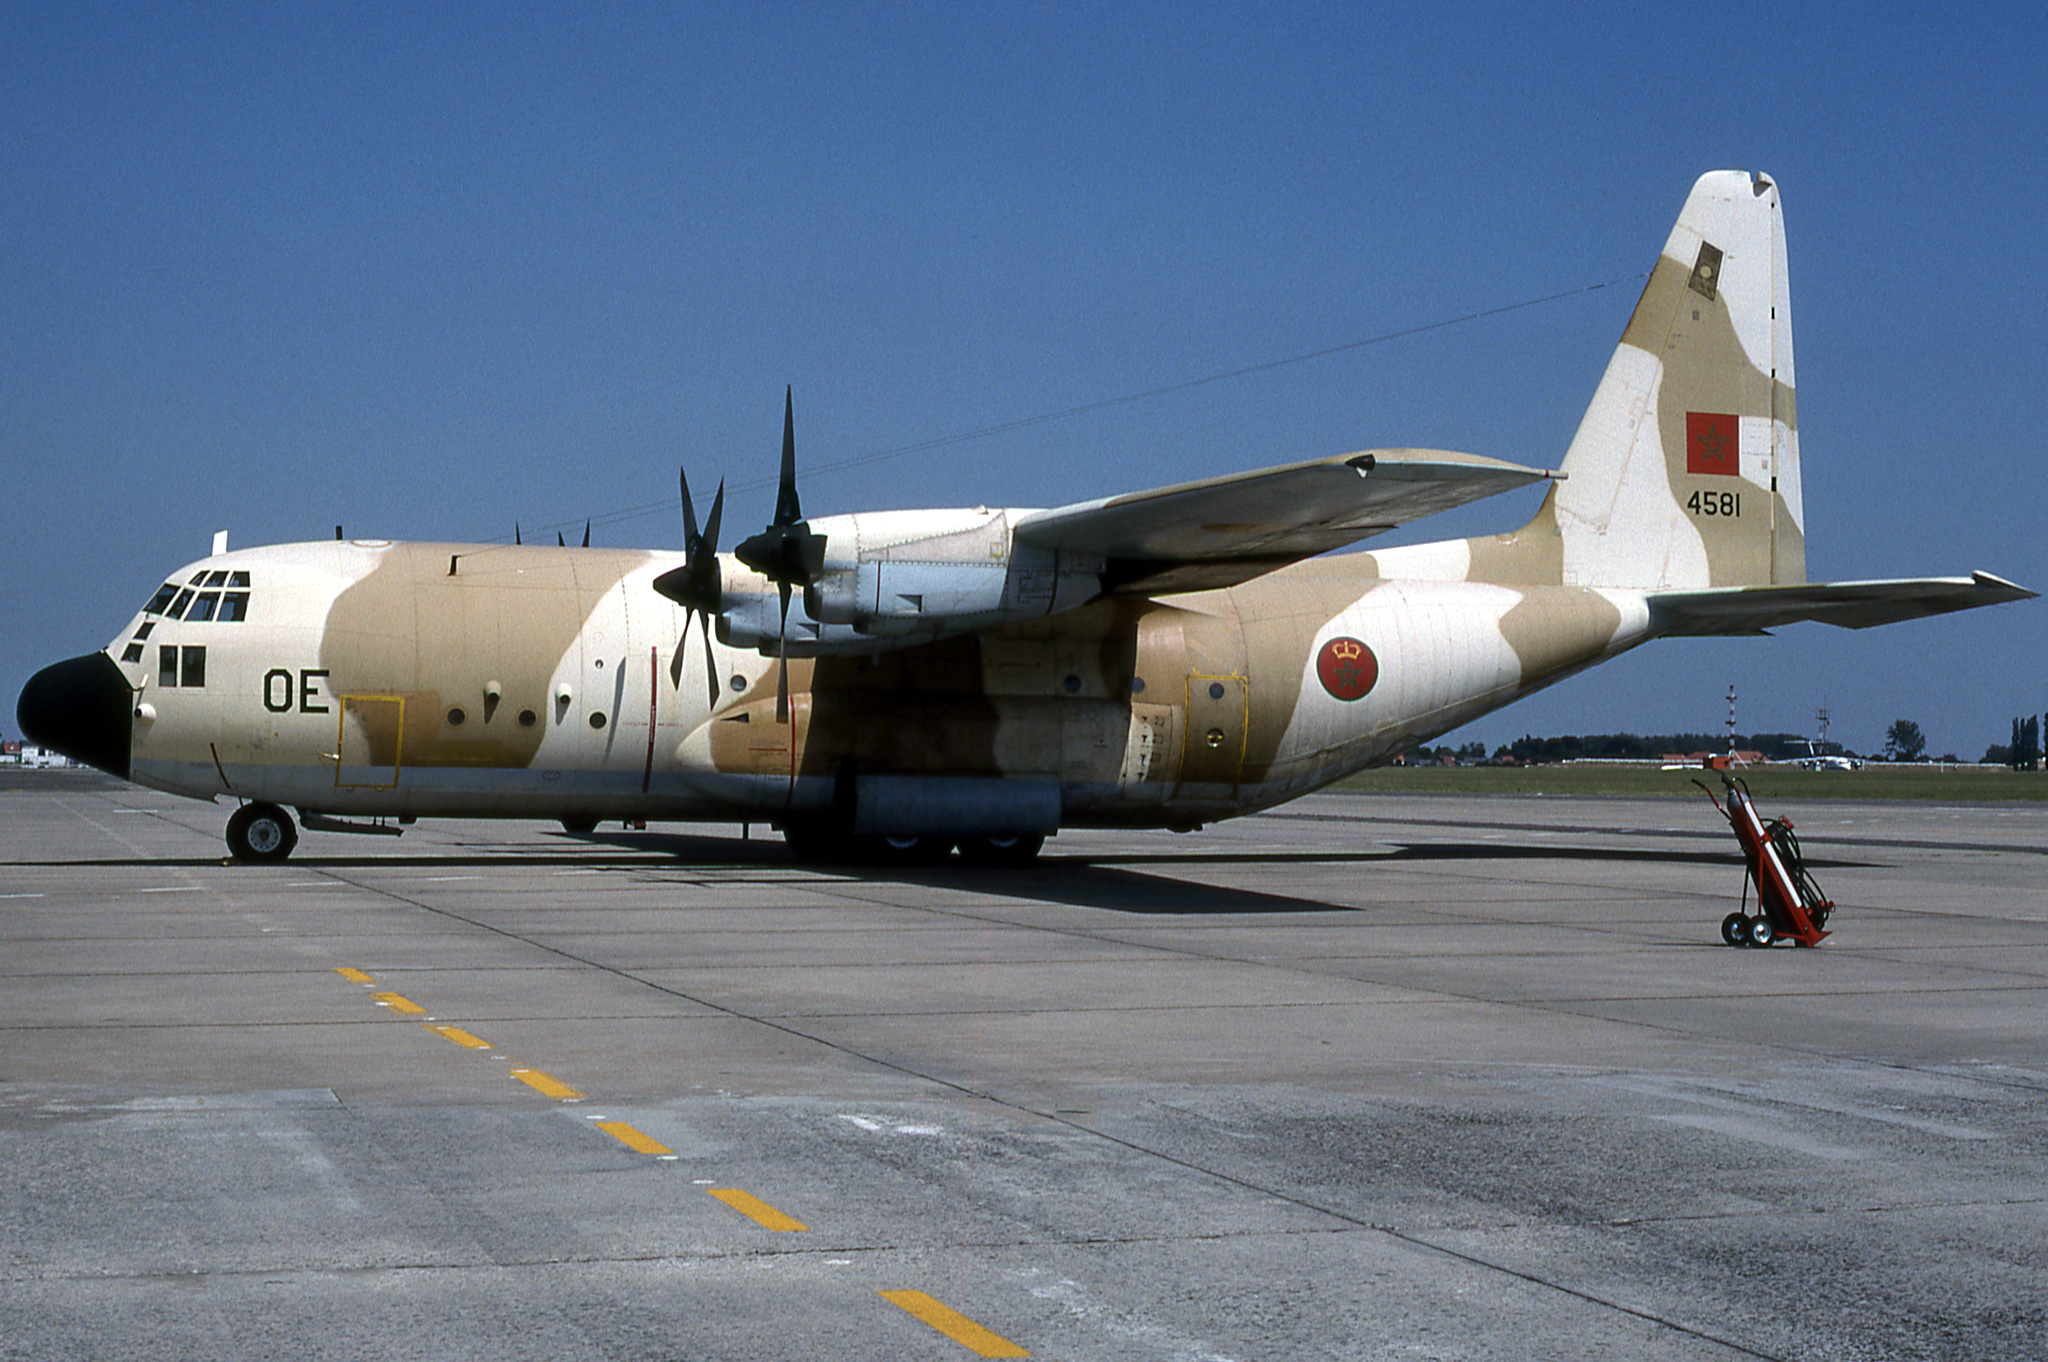 FRA: Photos d'avions de transport - Page 38 48463476747_cfa2c02c20_o